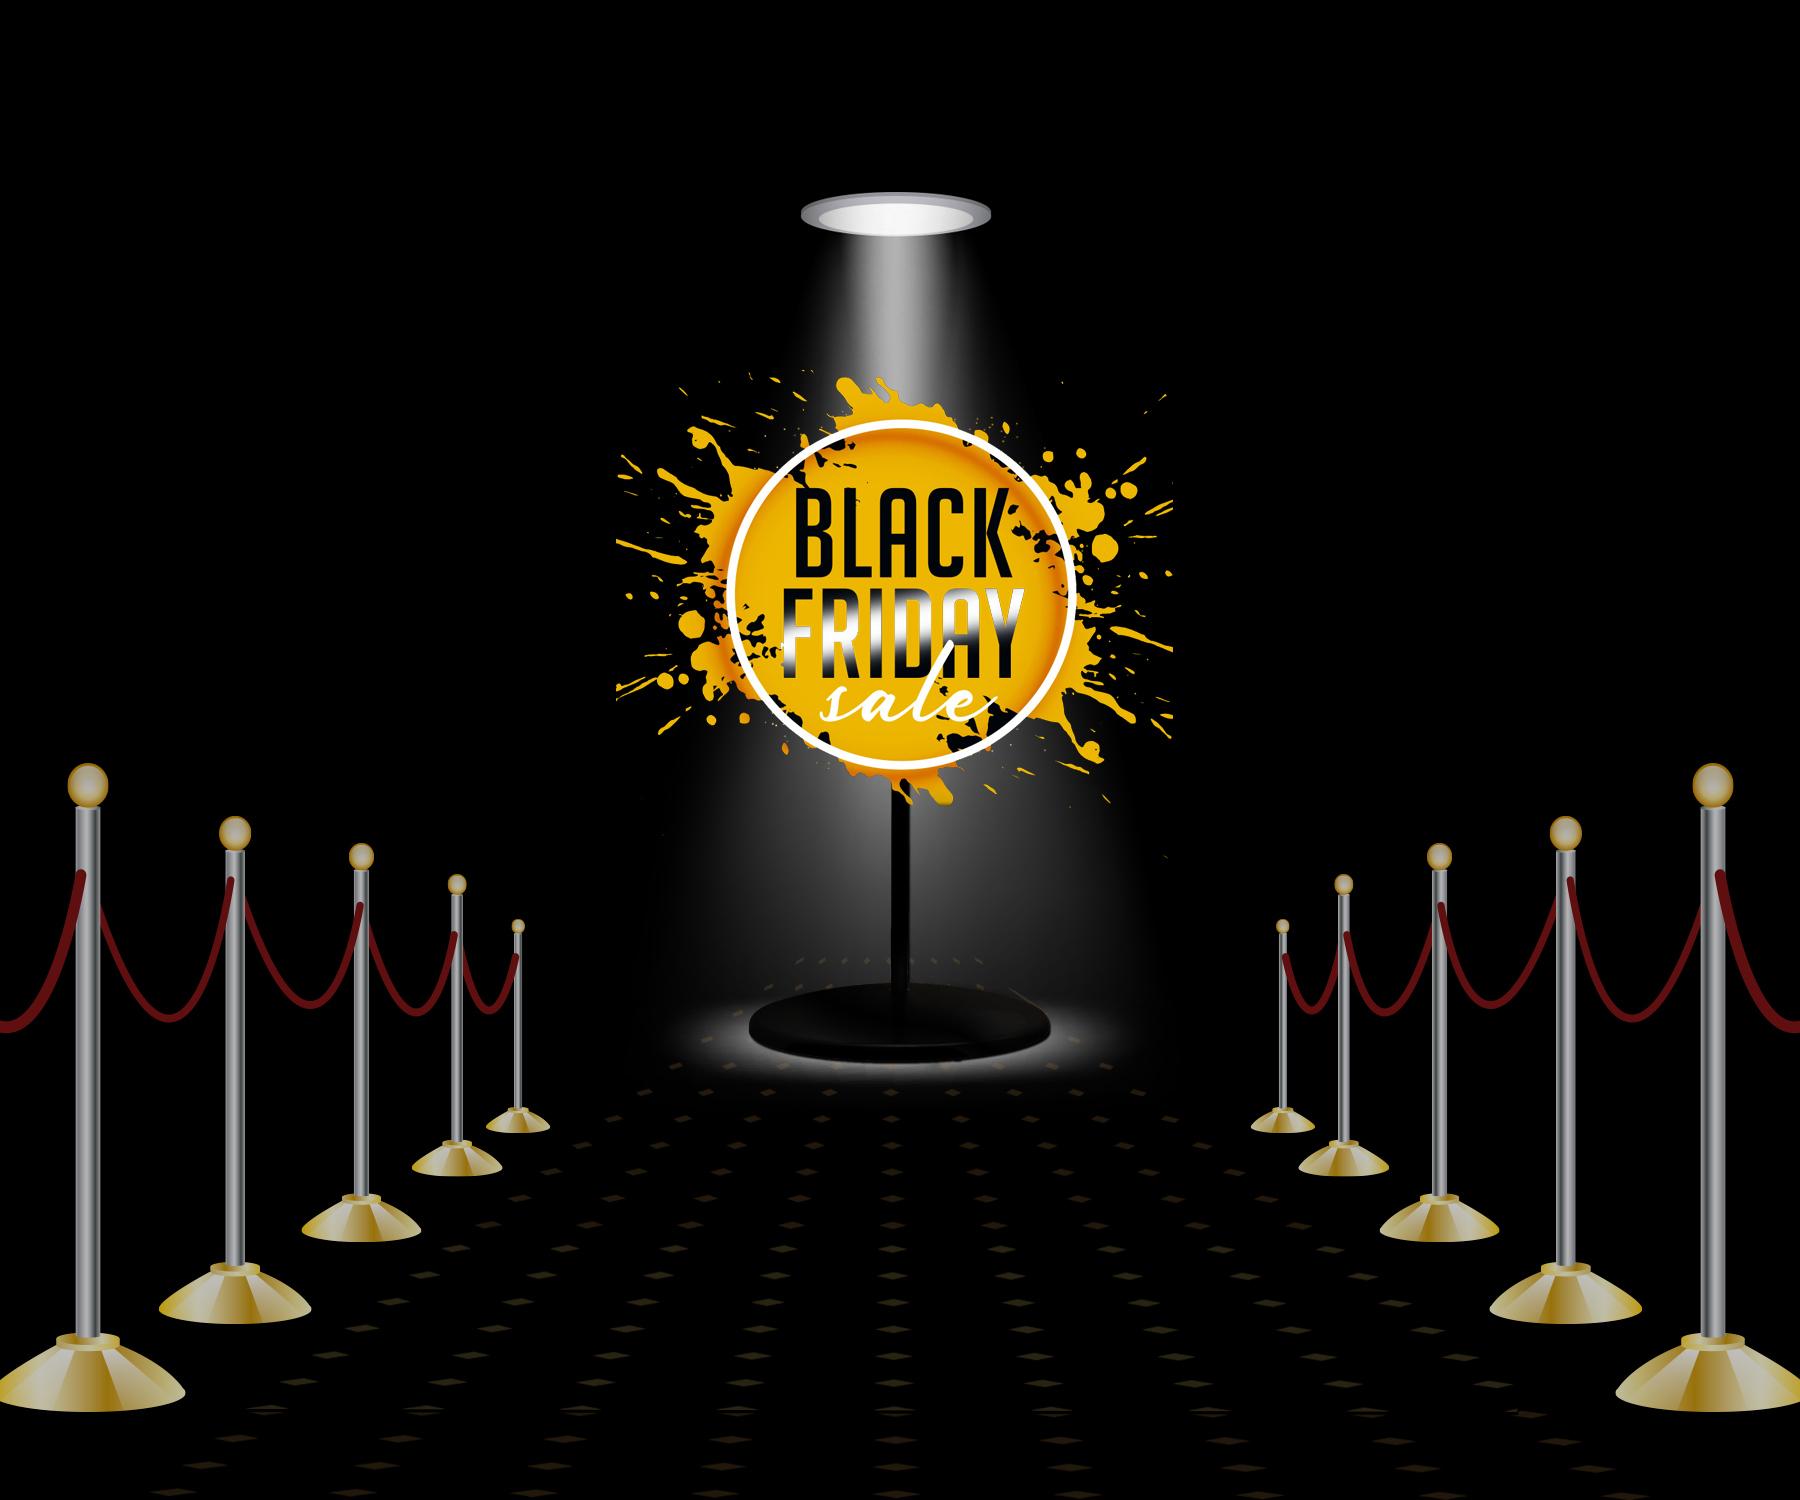 Black Friday στην ενοικίαση photobooth, Mirrorbooth από την Eventera.gr